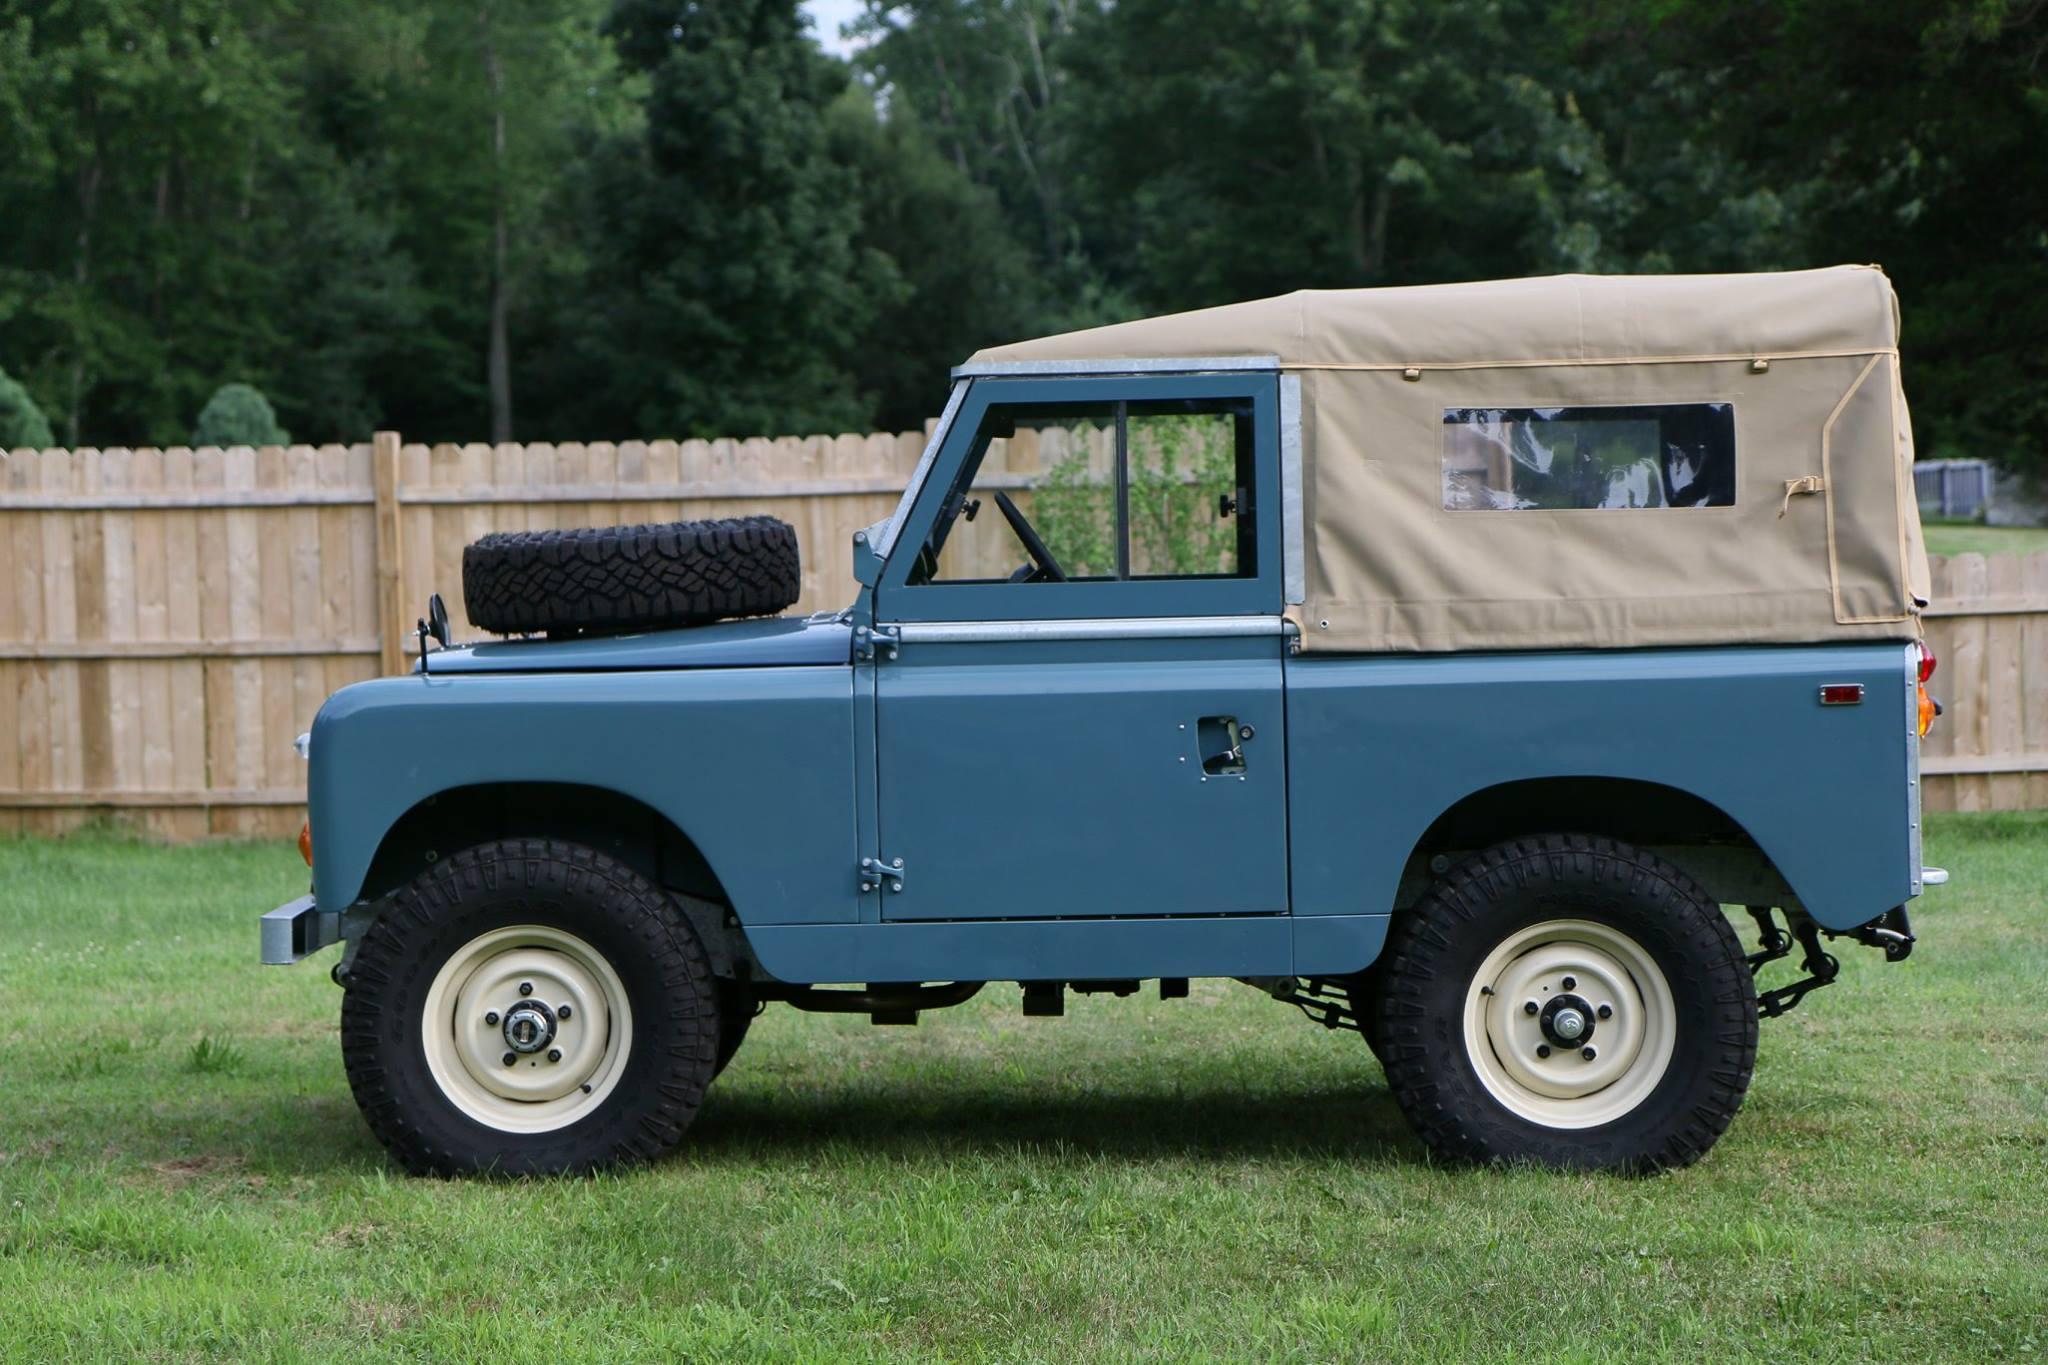 Engine Break In Oil >> 1969 Land Rover Series IIa - Full Restoration - North ...